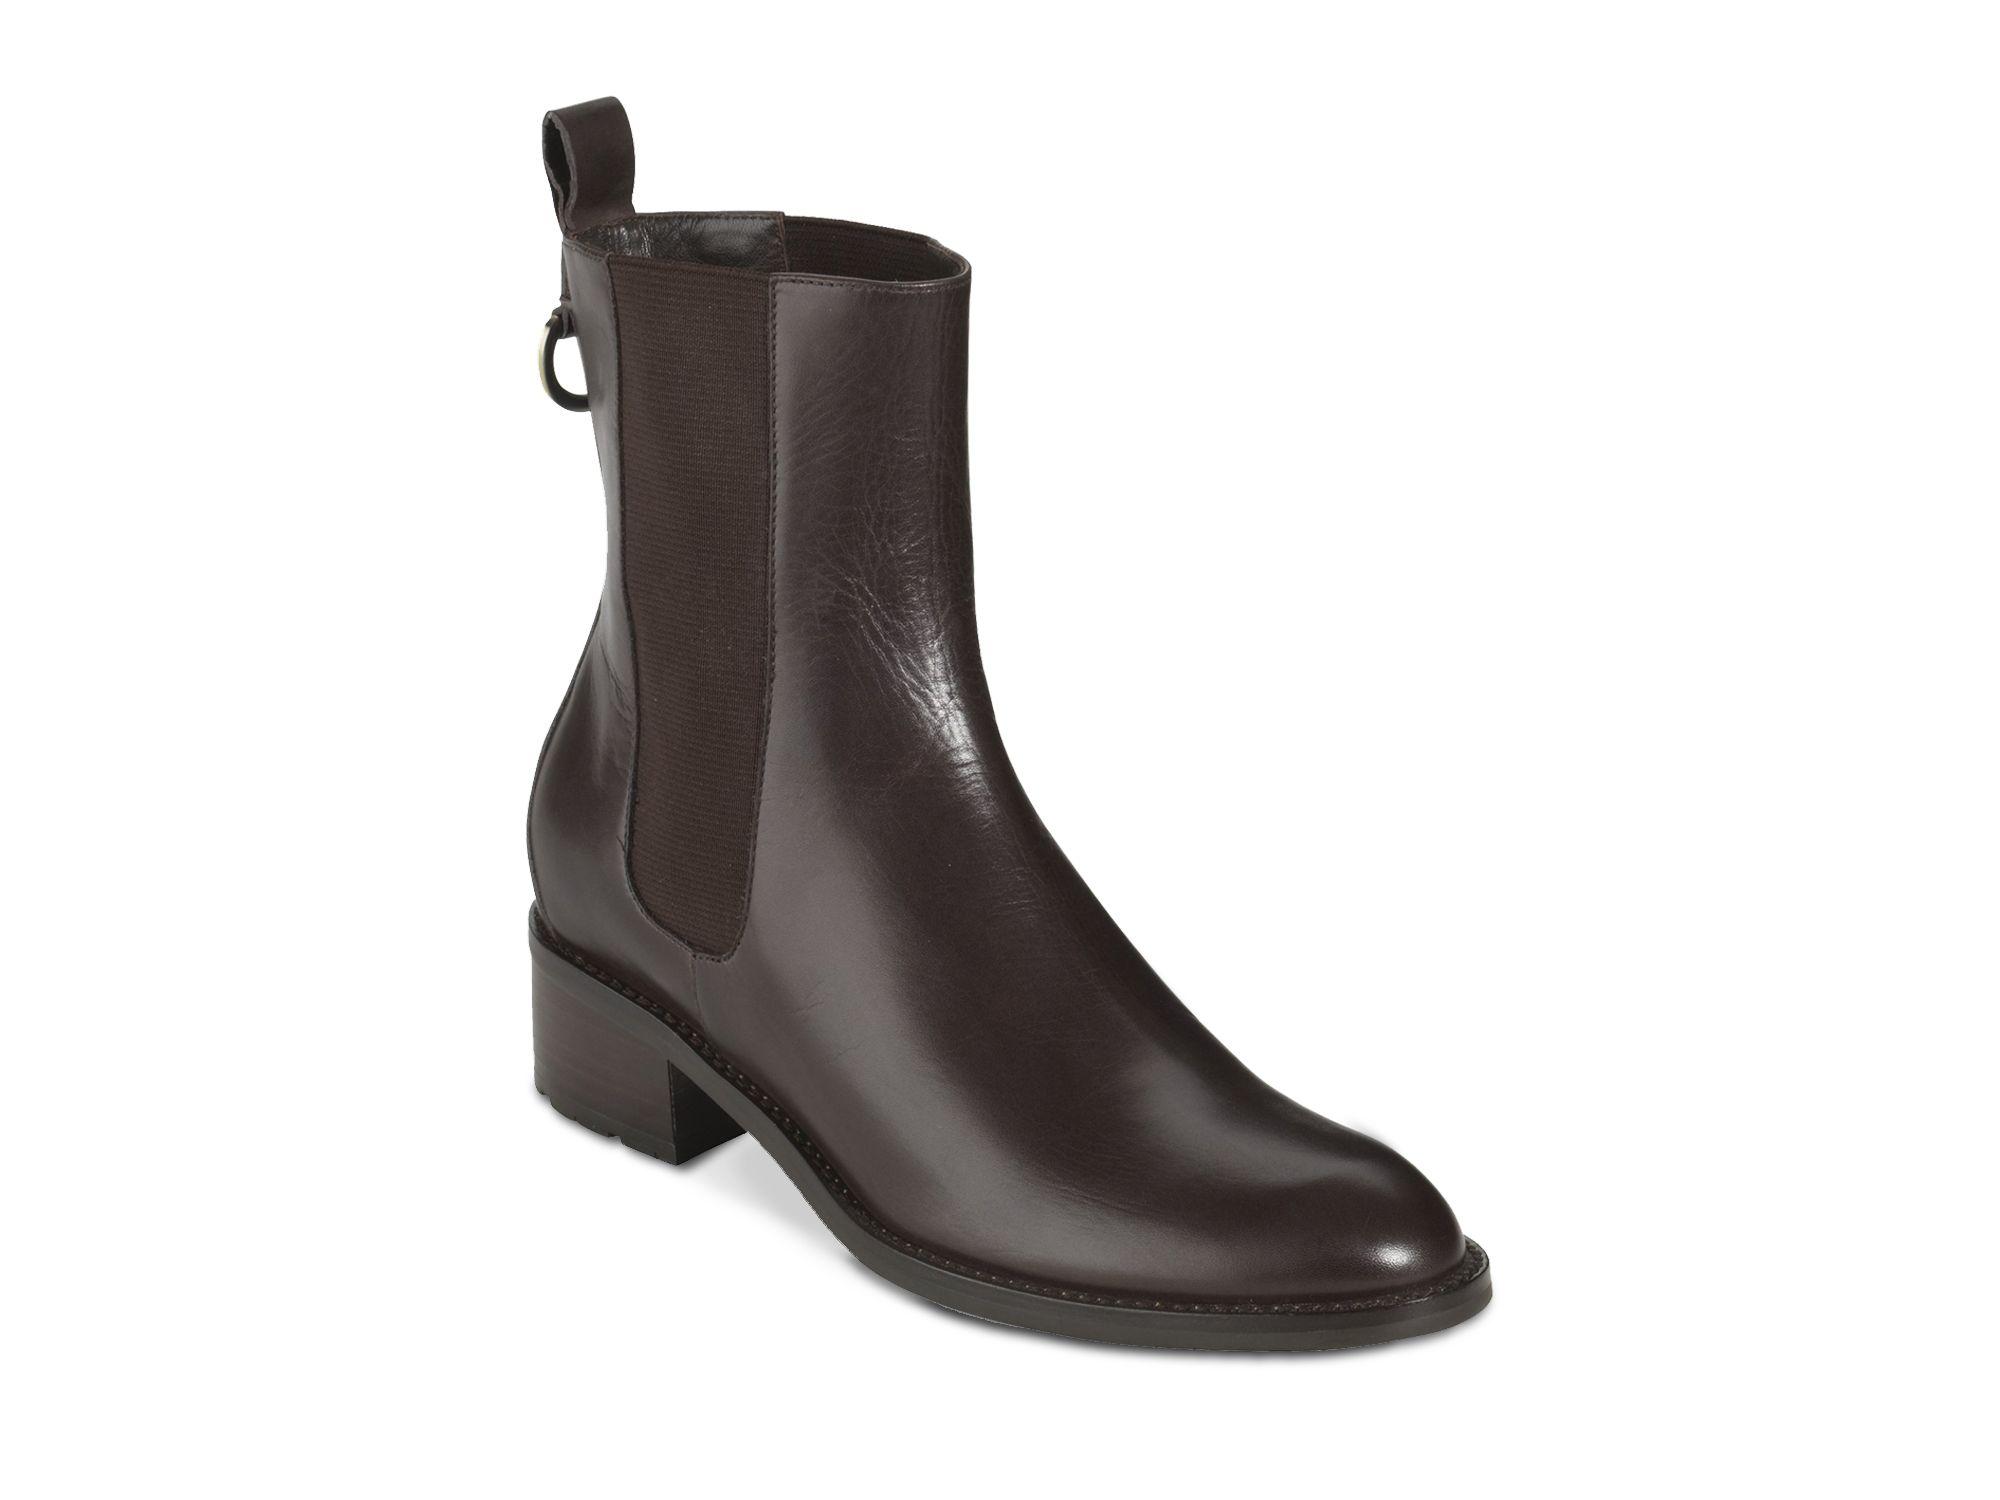 cole haan flat waterproof booties evan in black chocolate